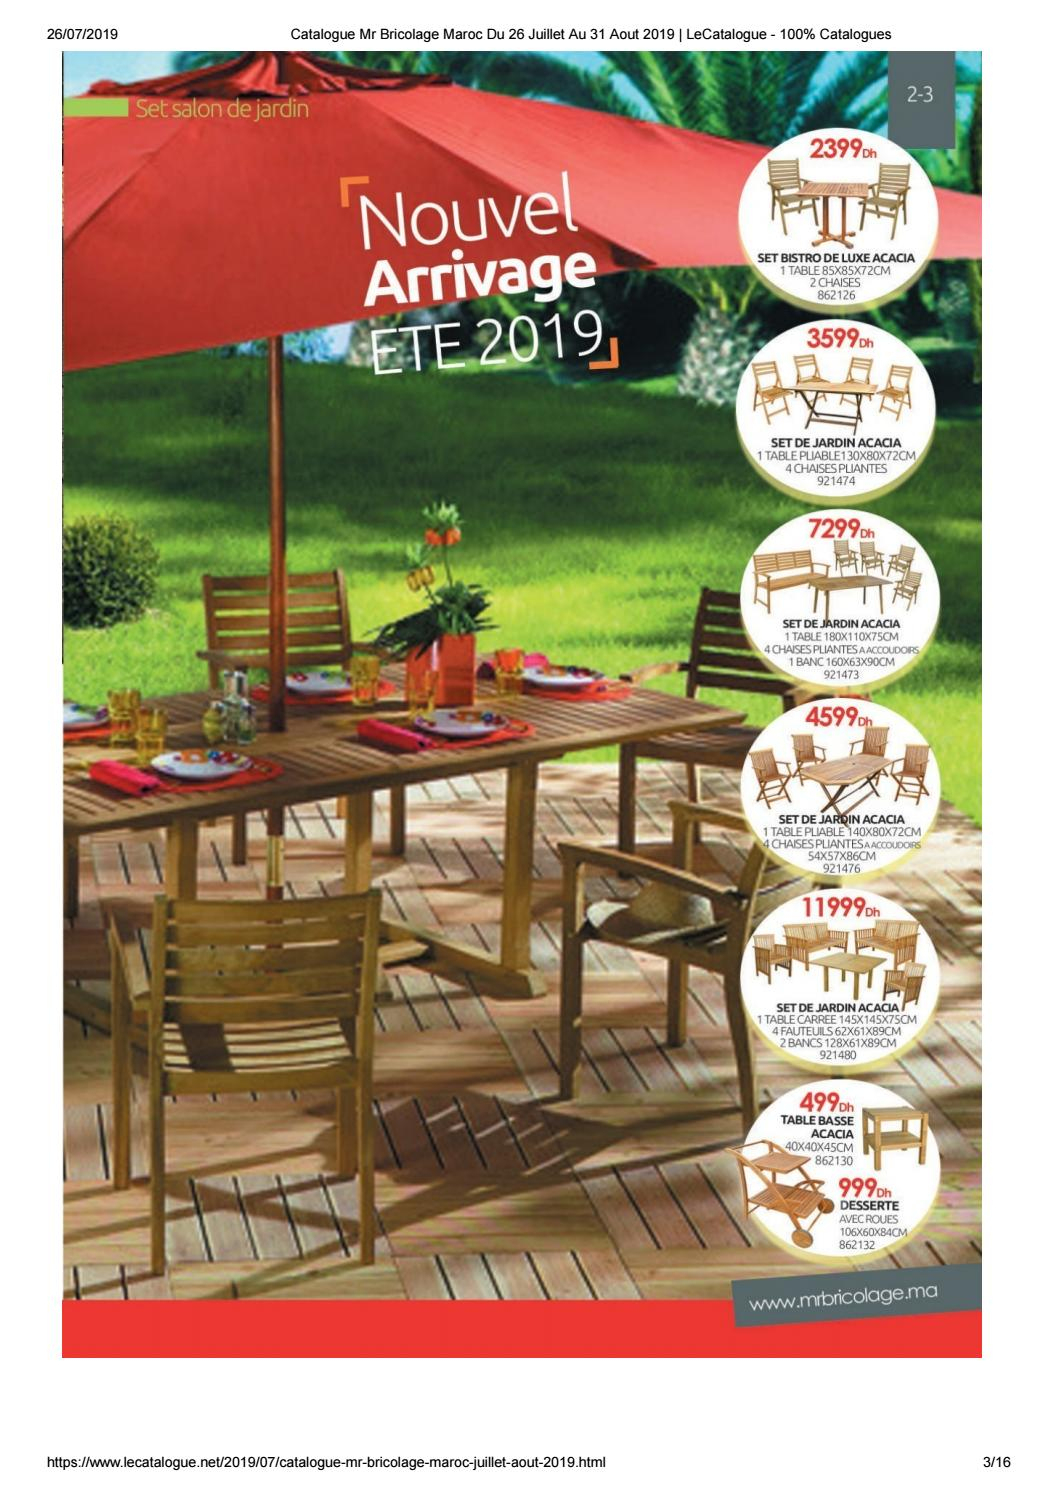 Promotion Set De Jardin Acacia pour Abri De Jardin Mr Bricolage